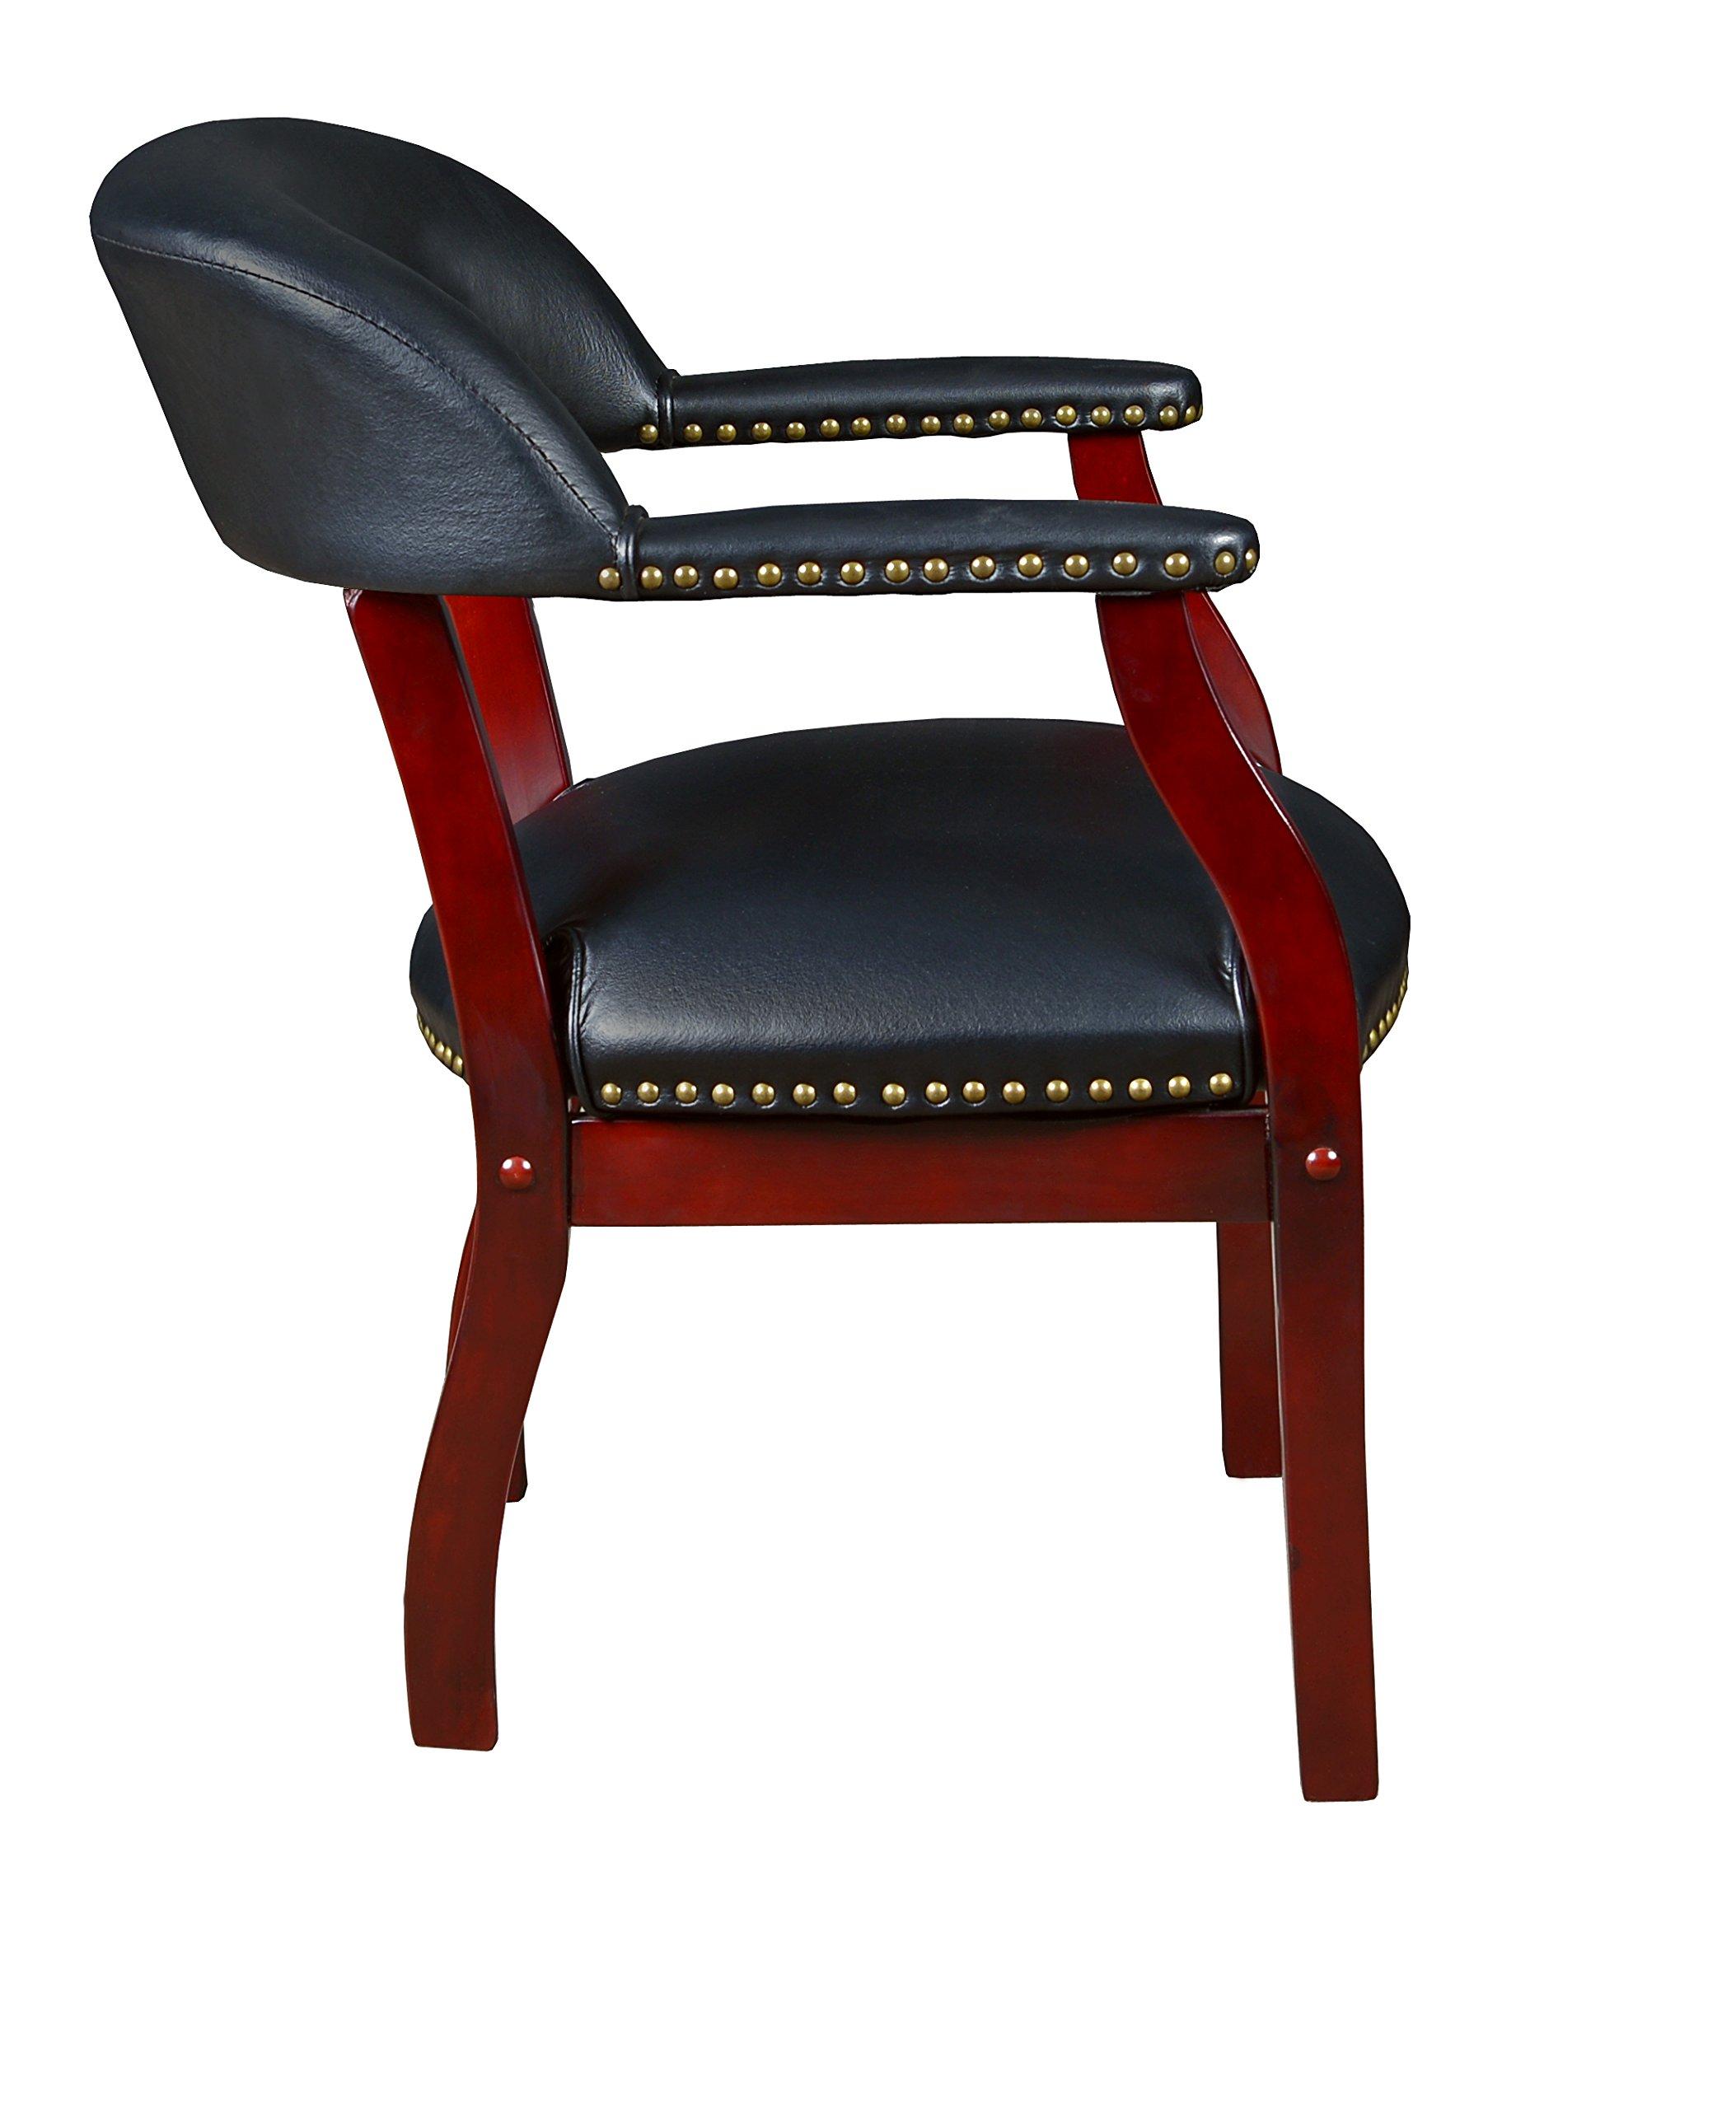 Regency Ivy League Captain Chair, Black by Regency (Image #5)